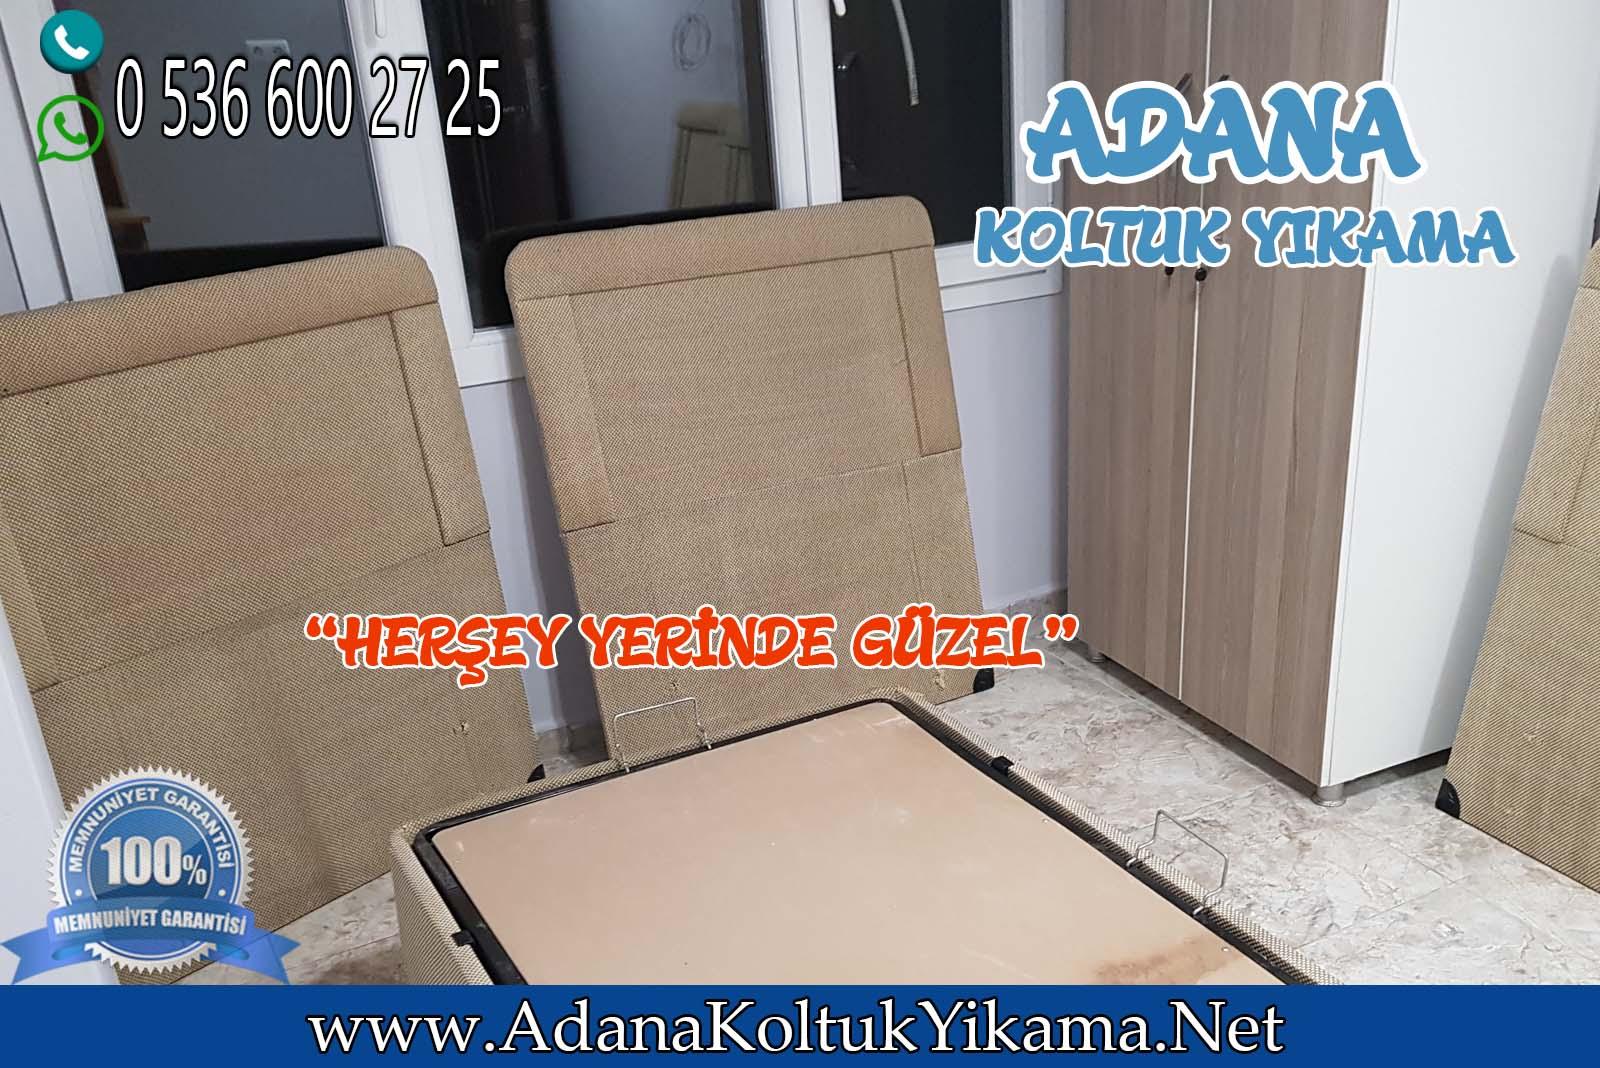 Adana Koltuk Yıkama + Anka Kız Yurdu + Yatak + Baza Yıkama